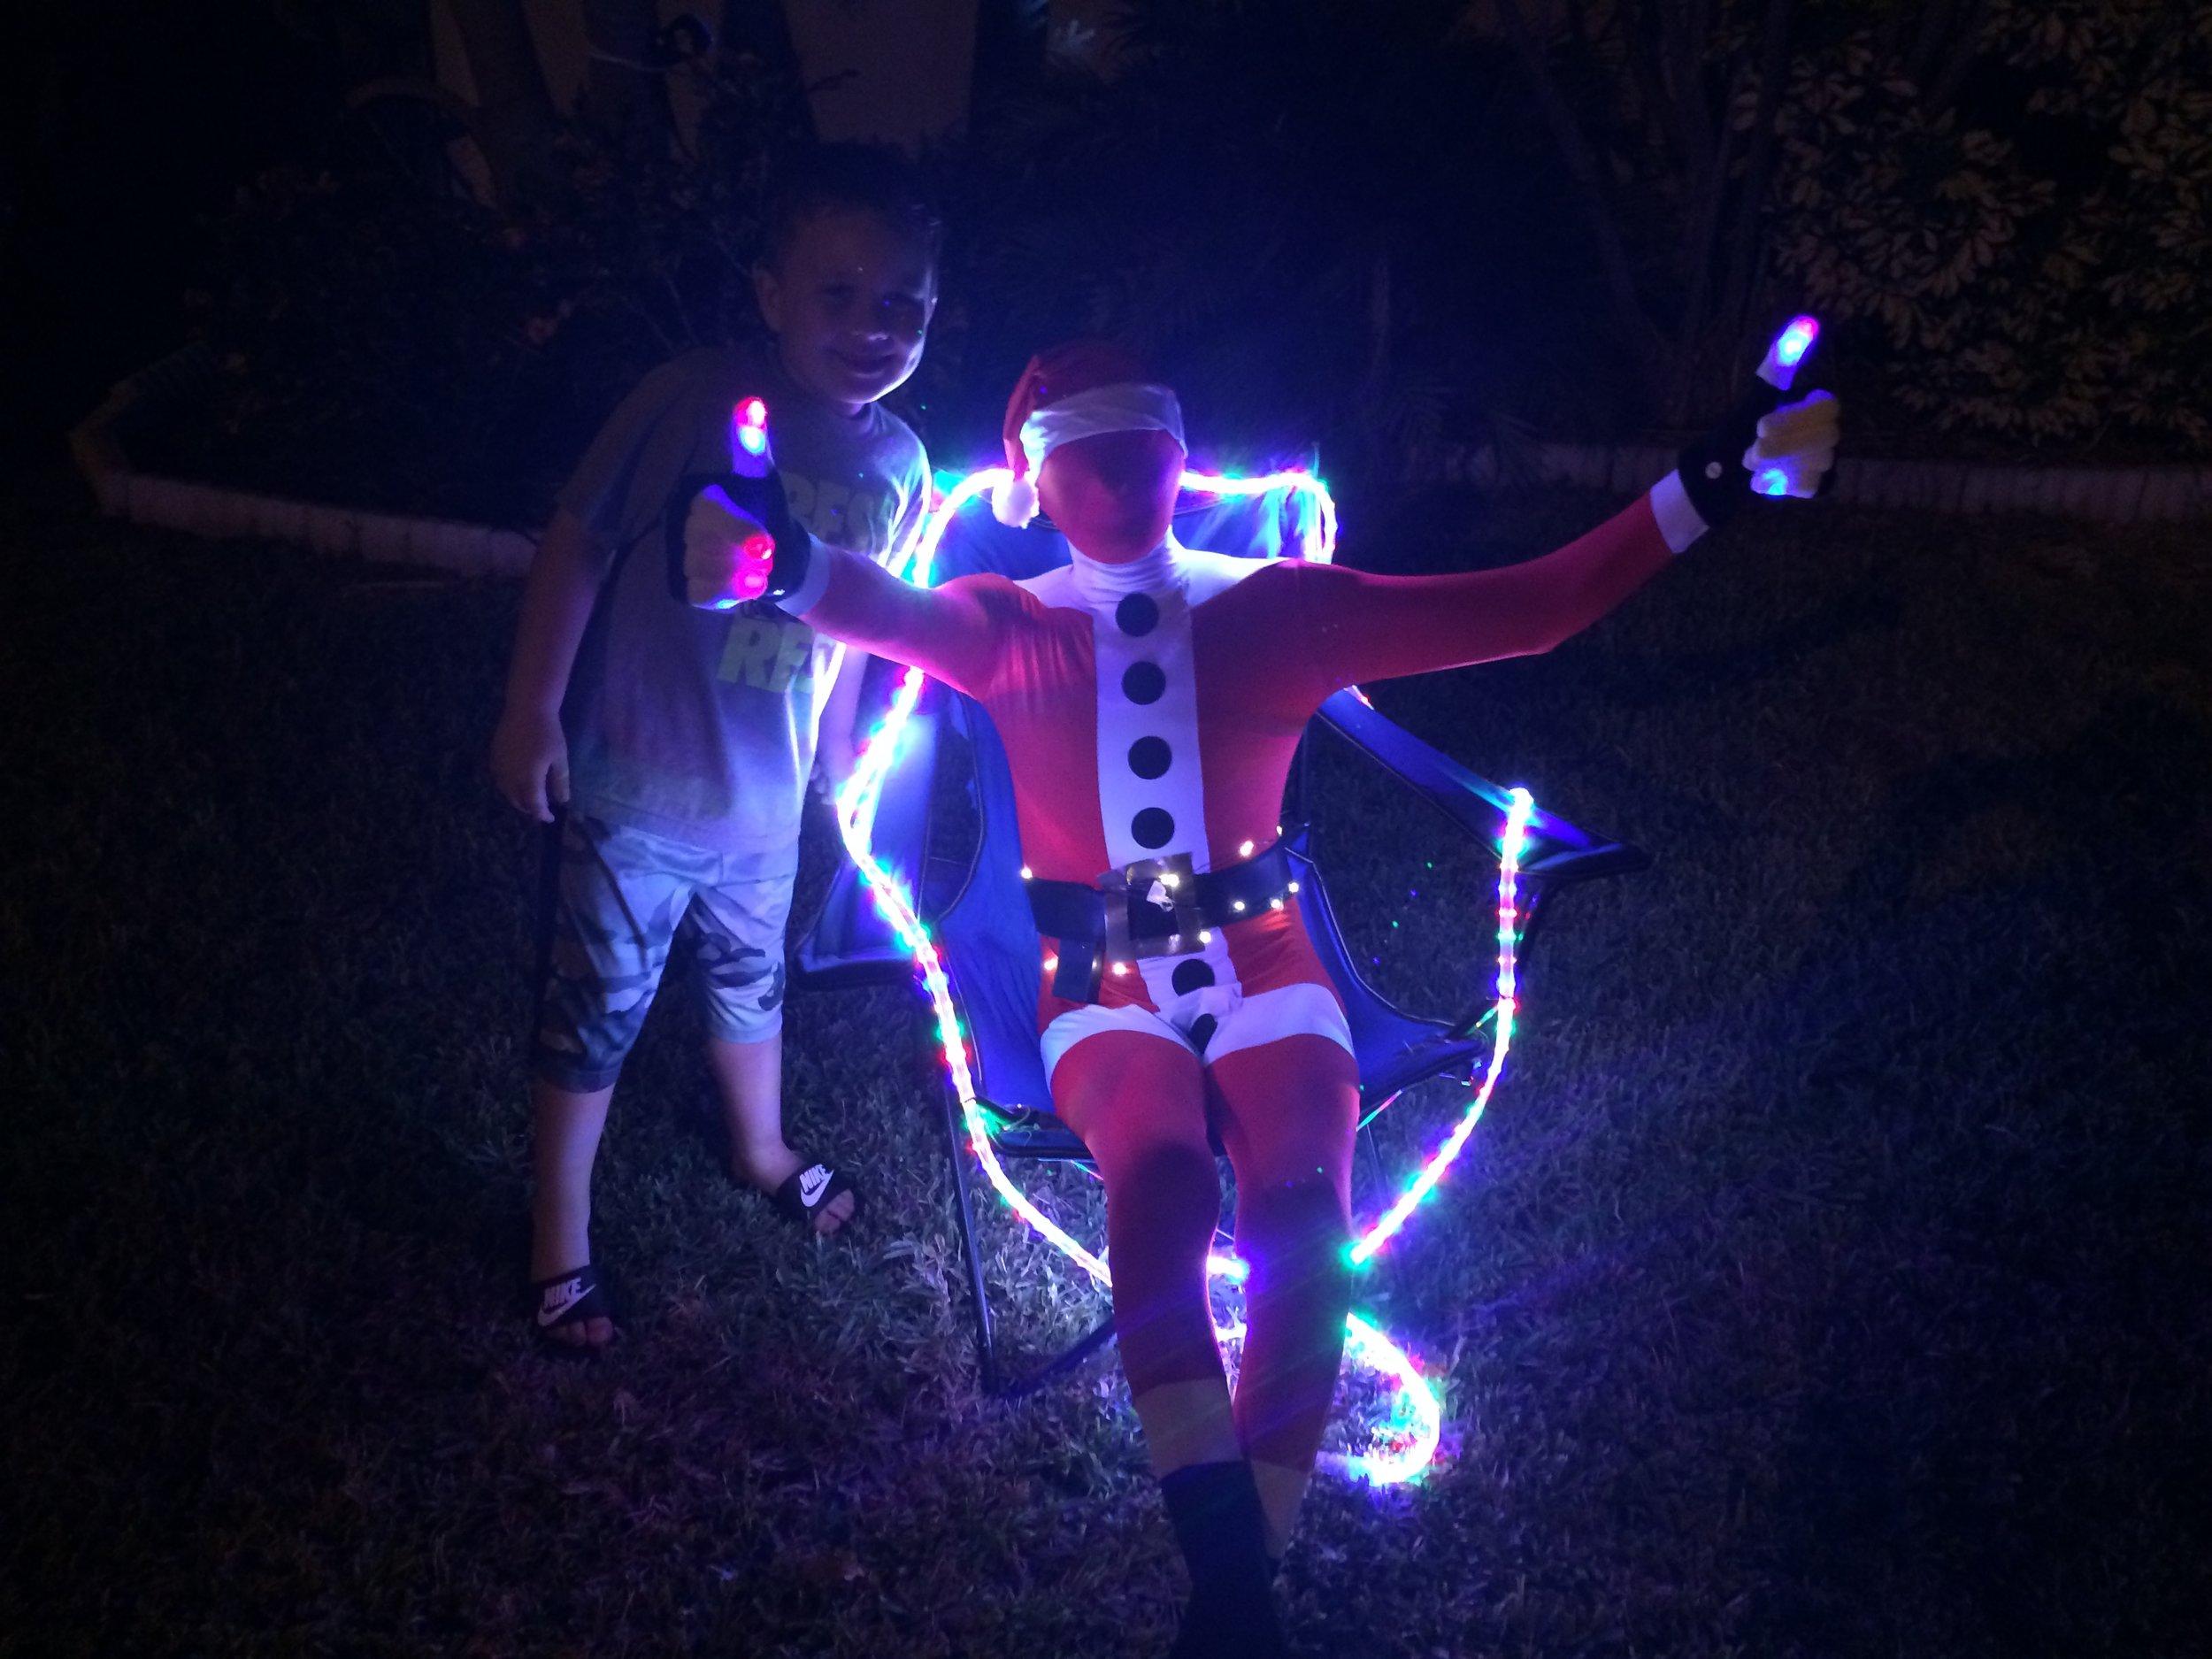 Matthew Hetu & Santa's Electric Helper